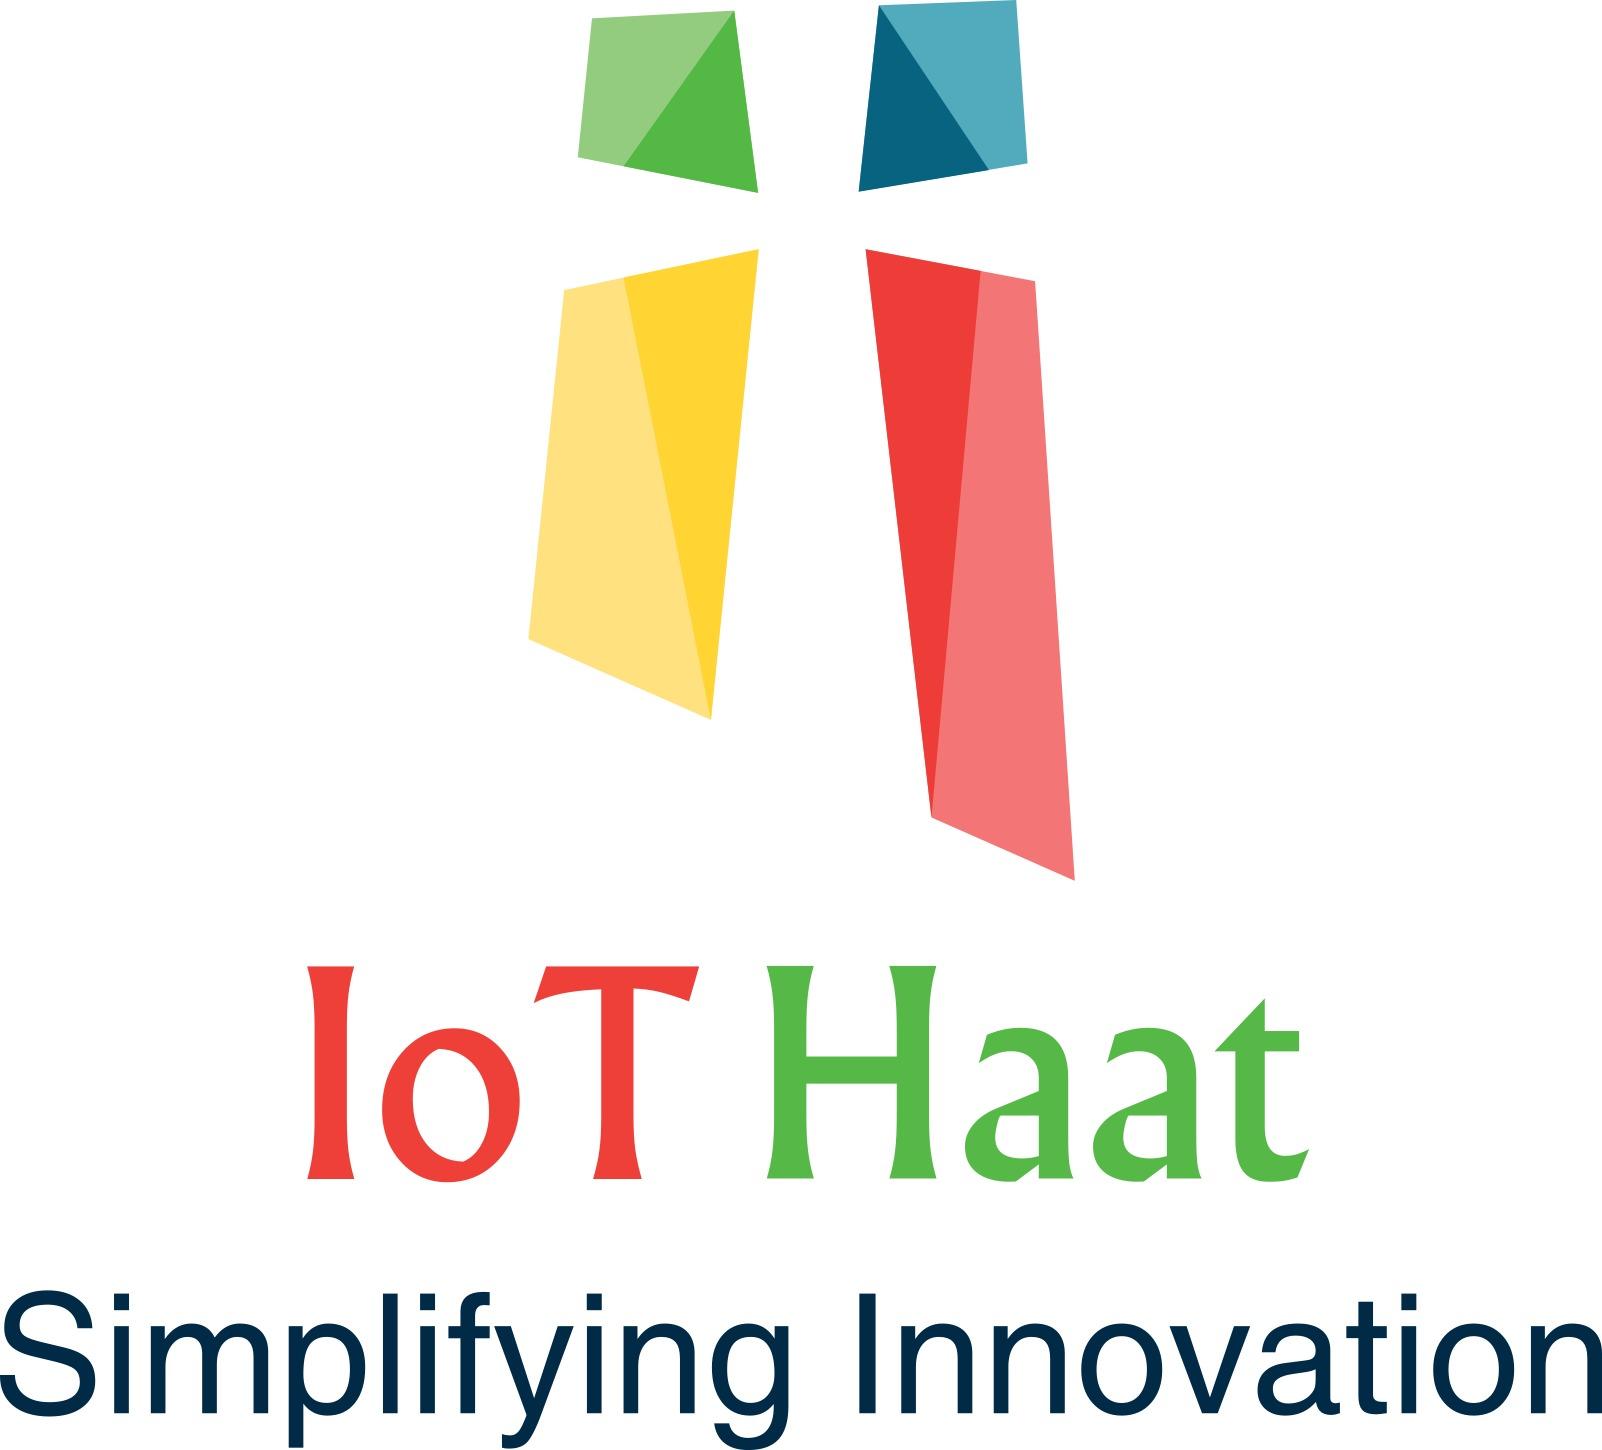 Internet of Things | IoT | IIoT | Voice Enable Solutions | IoT Haat